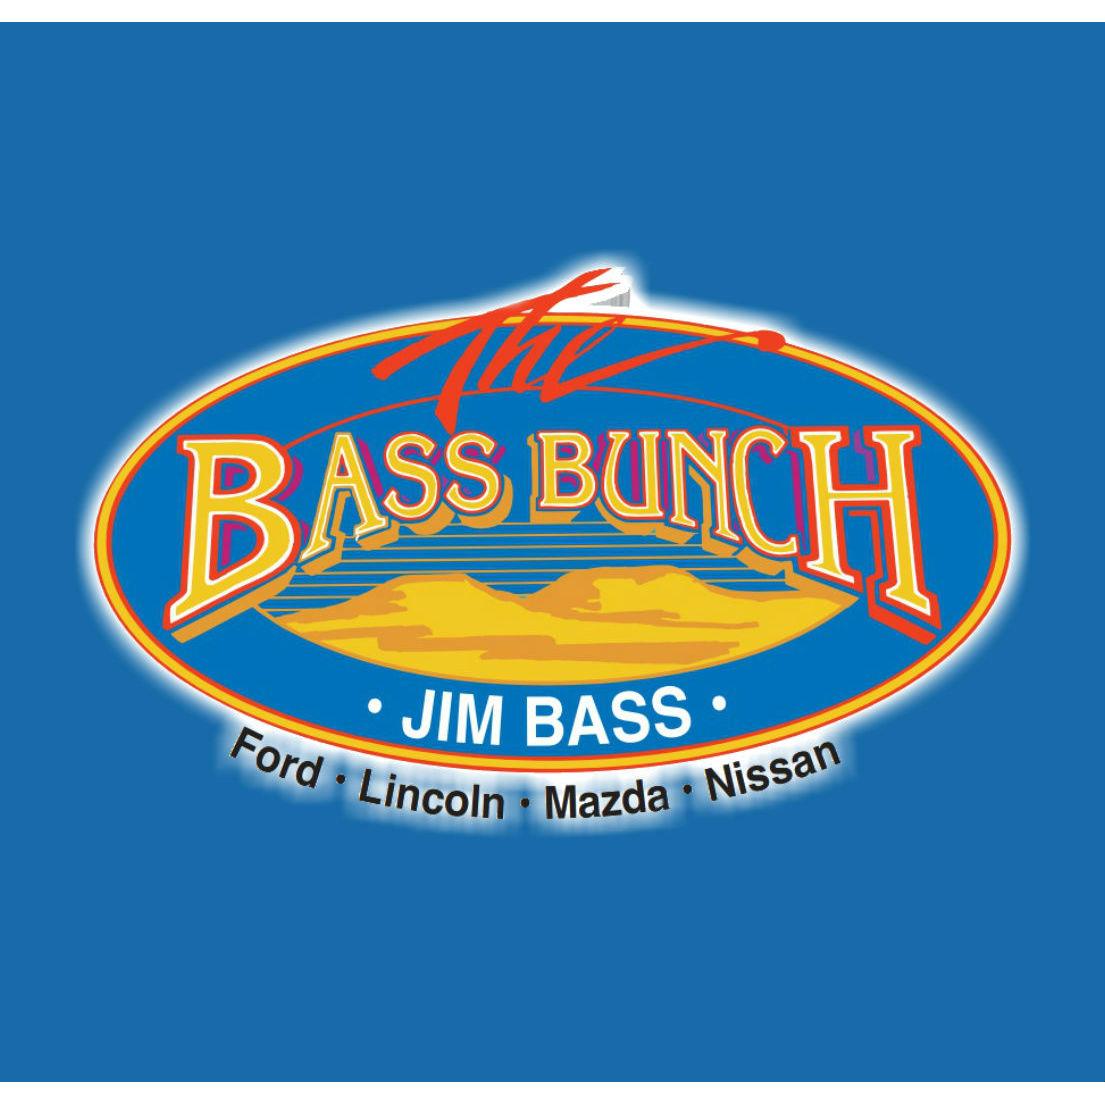 Jim Bass Cars And Trucks